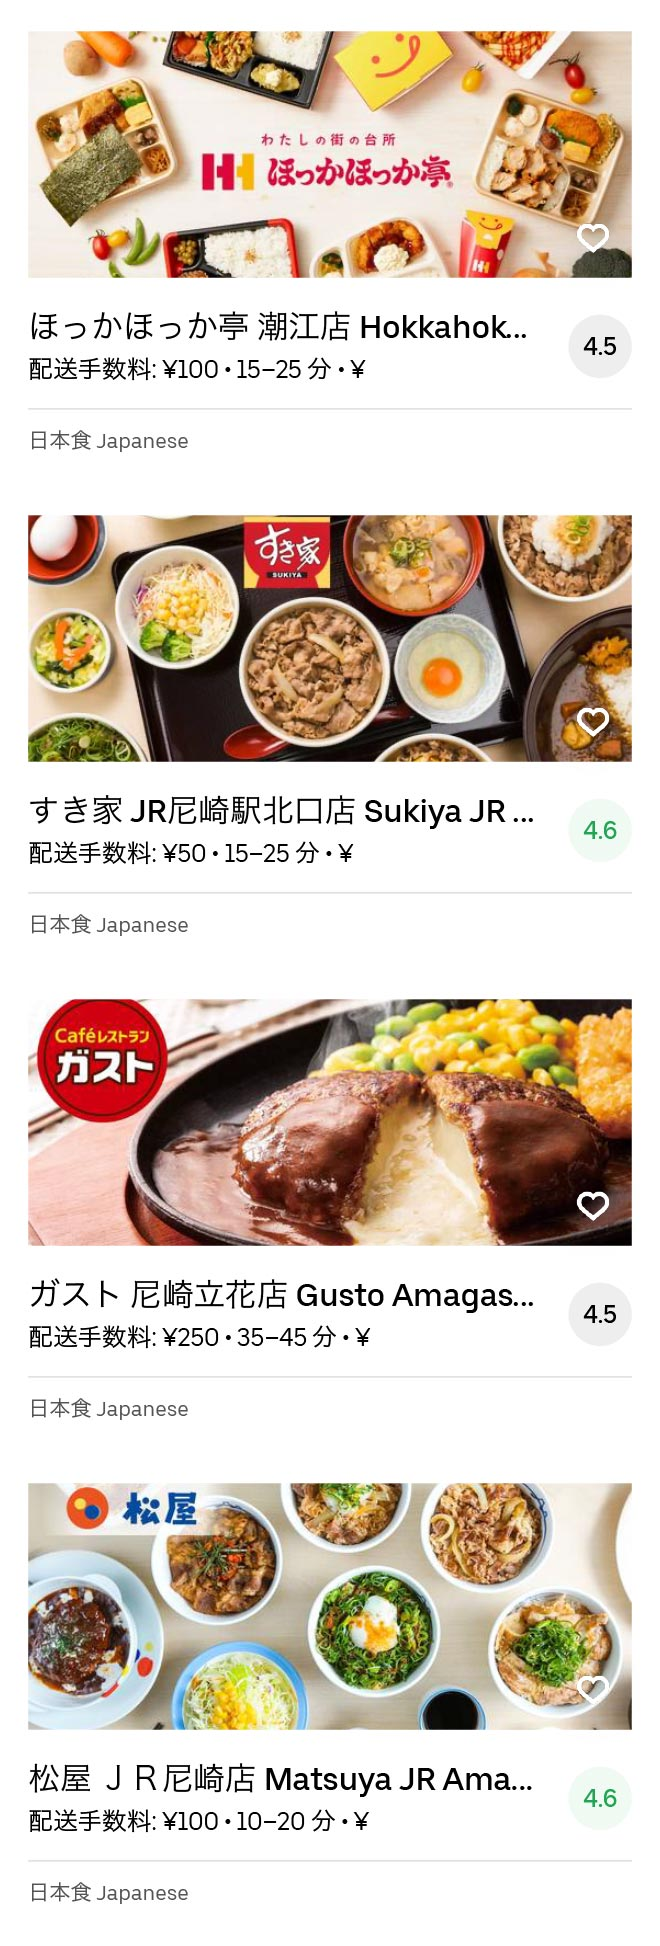 Amagasaki menu 2005 03